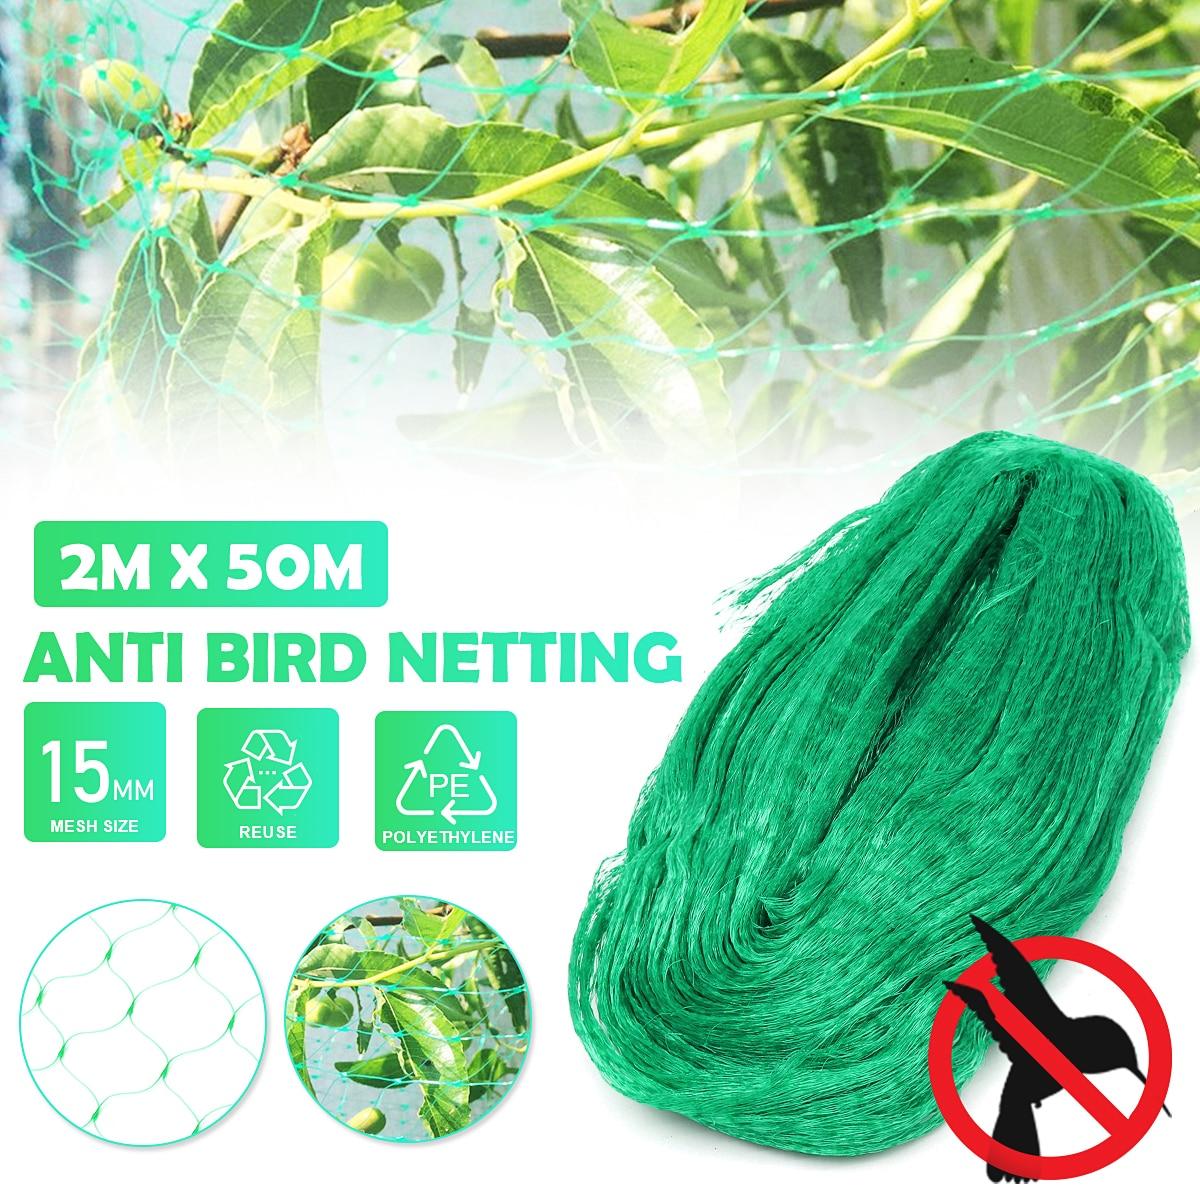 2x50m אנטי ציפור נקי בריכת רשתות הגנה פרדס גן חוות יבול צמח גידולי פירות עץ ירקות פרח גן Mesh להגן על